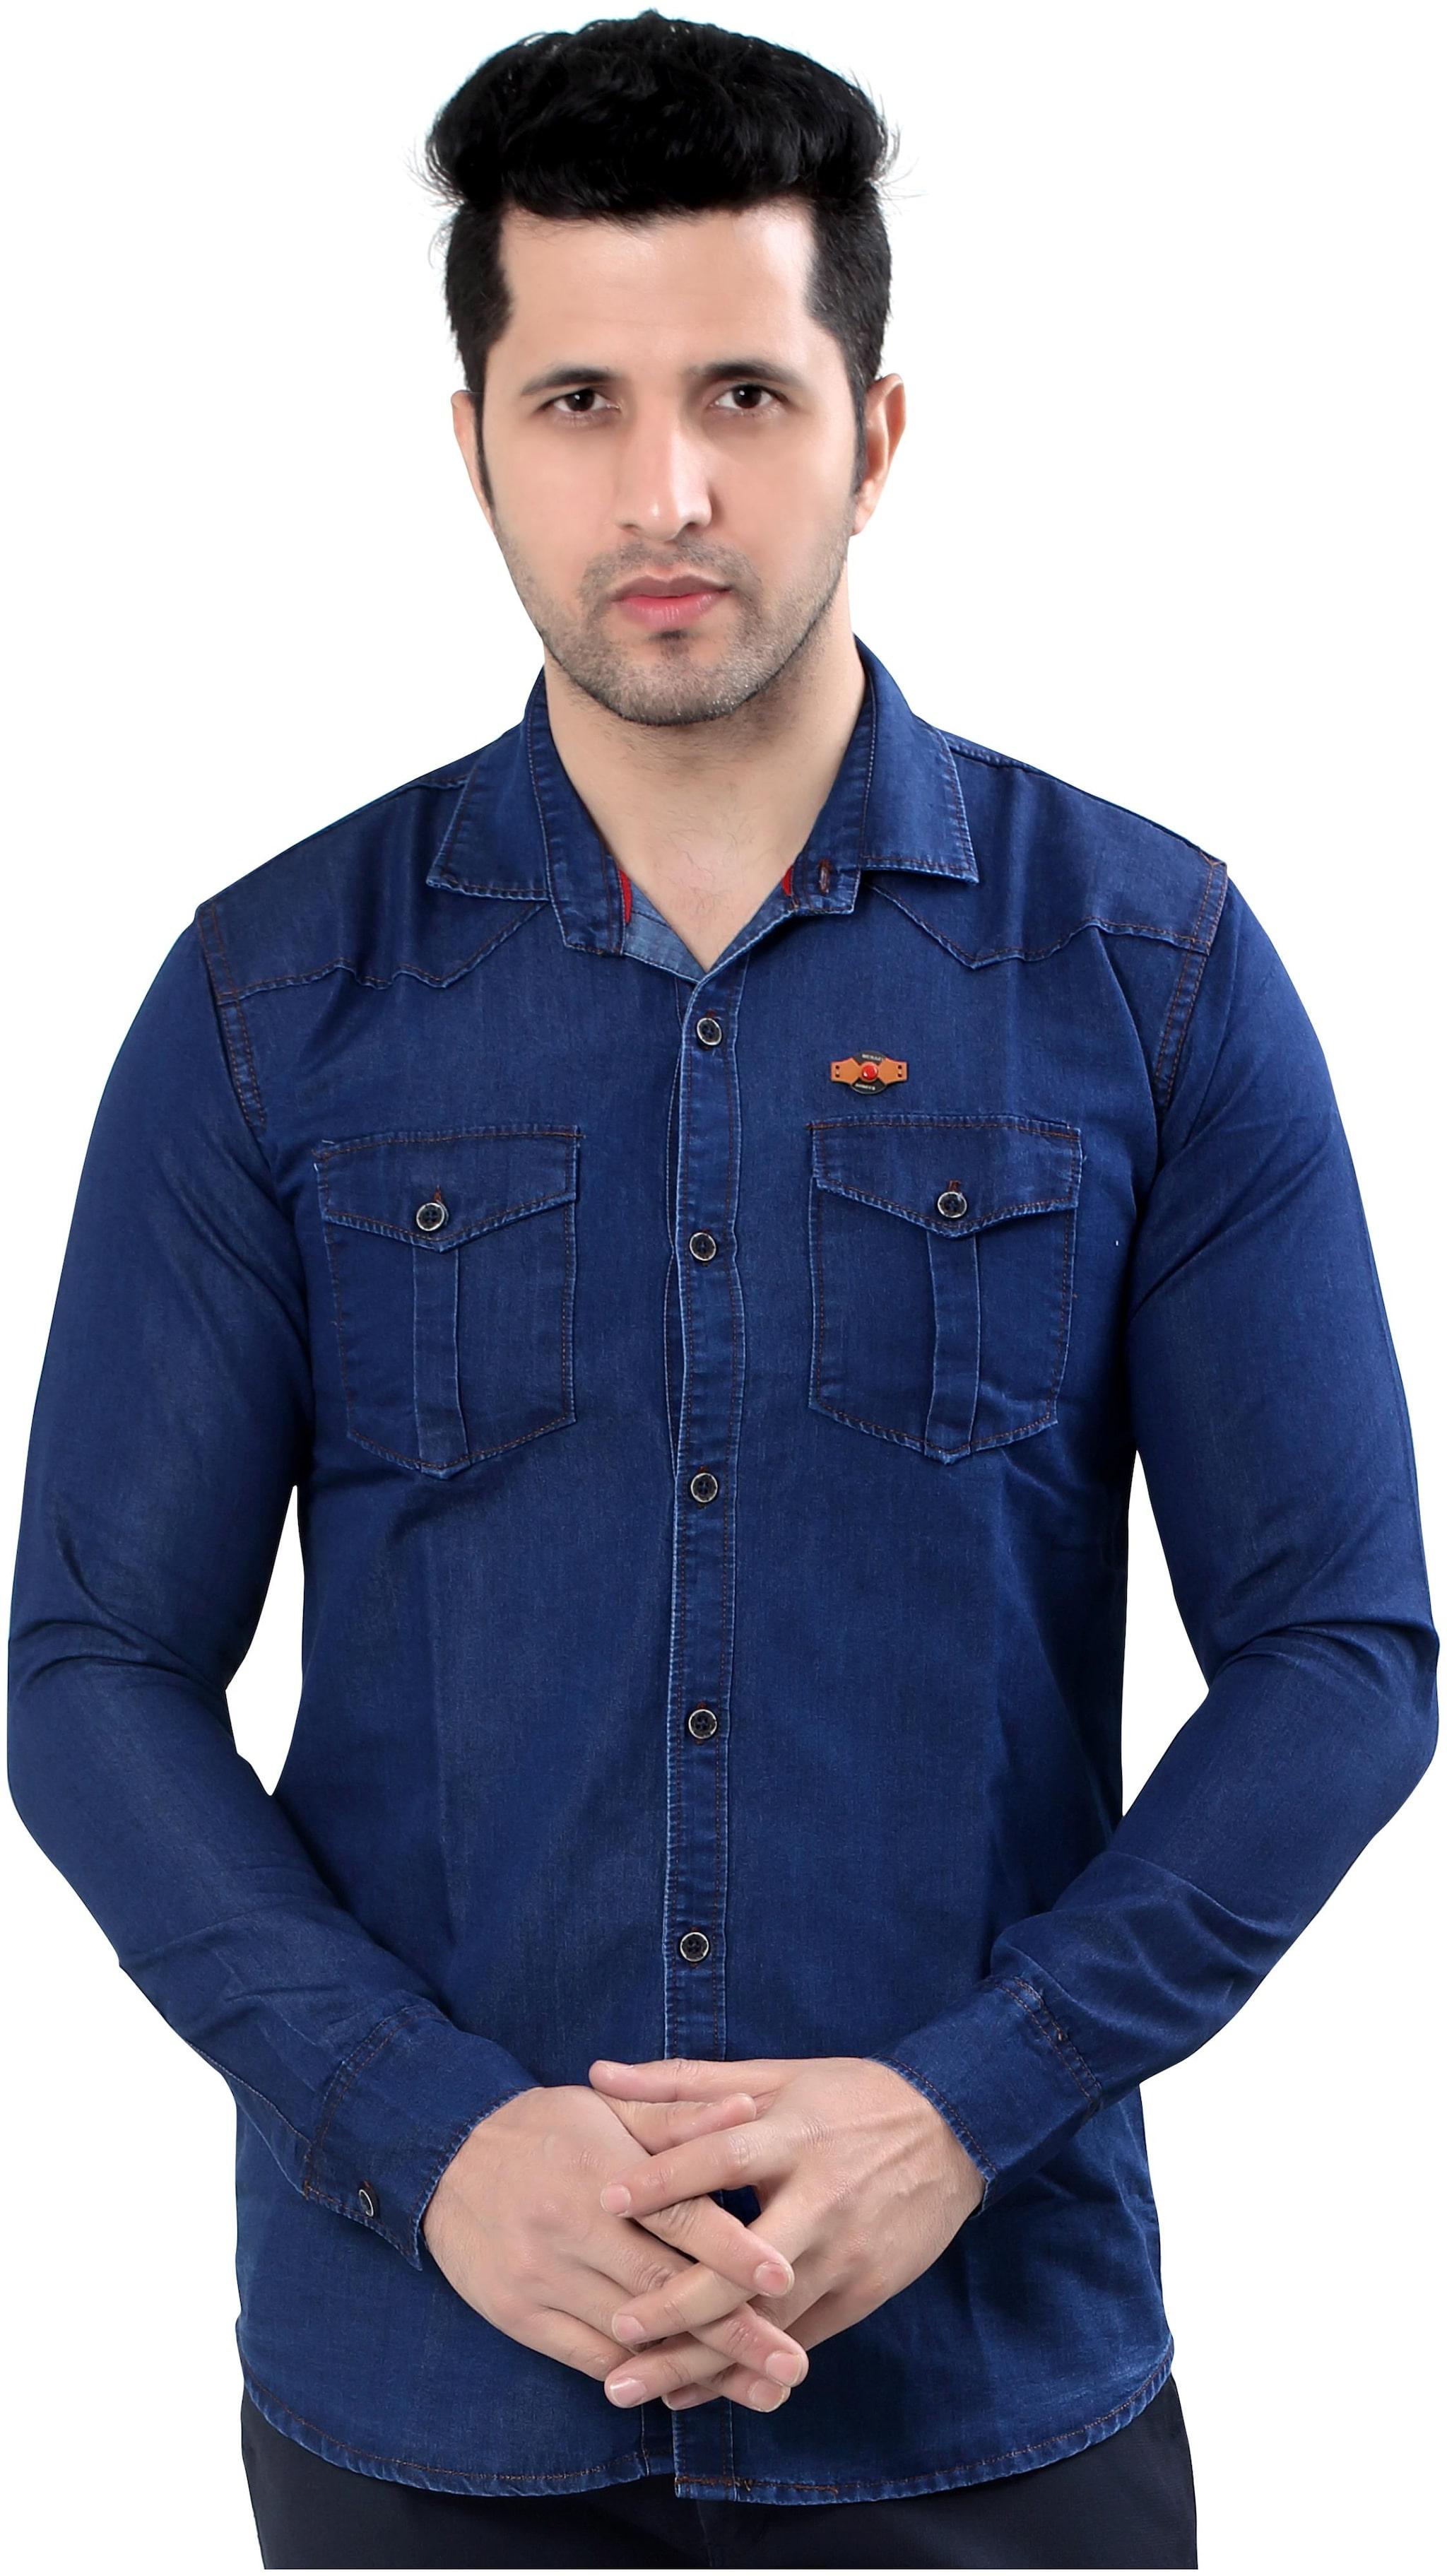 Private Image Men Blue Solid Slim Fit Casual Shirt by Meraki Enterprises